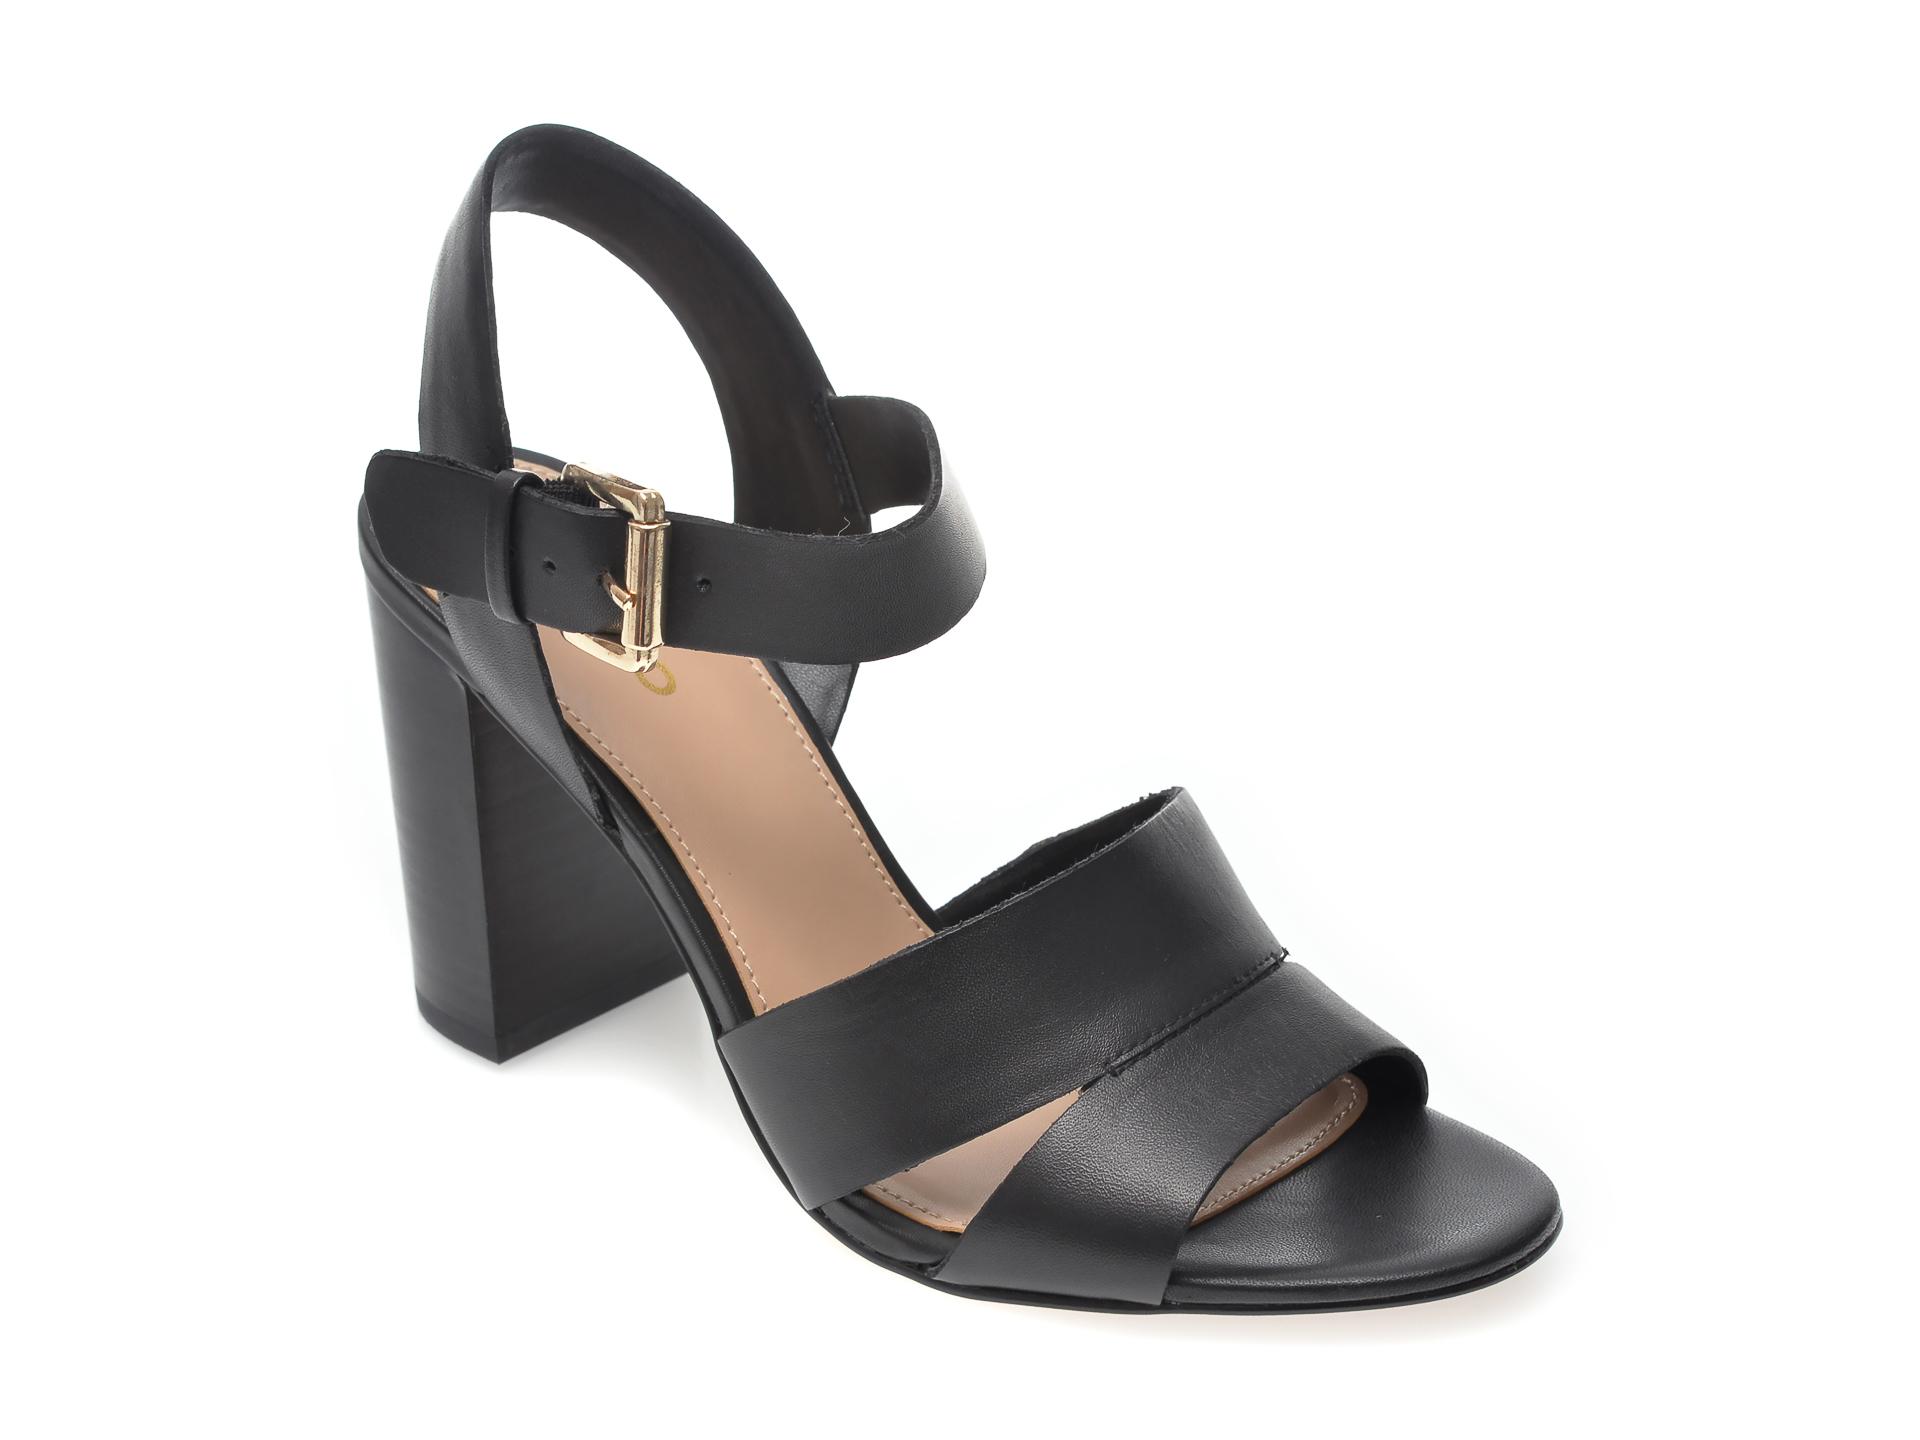 Sandale ALDO negre, Caparosa001, din piele naturala New